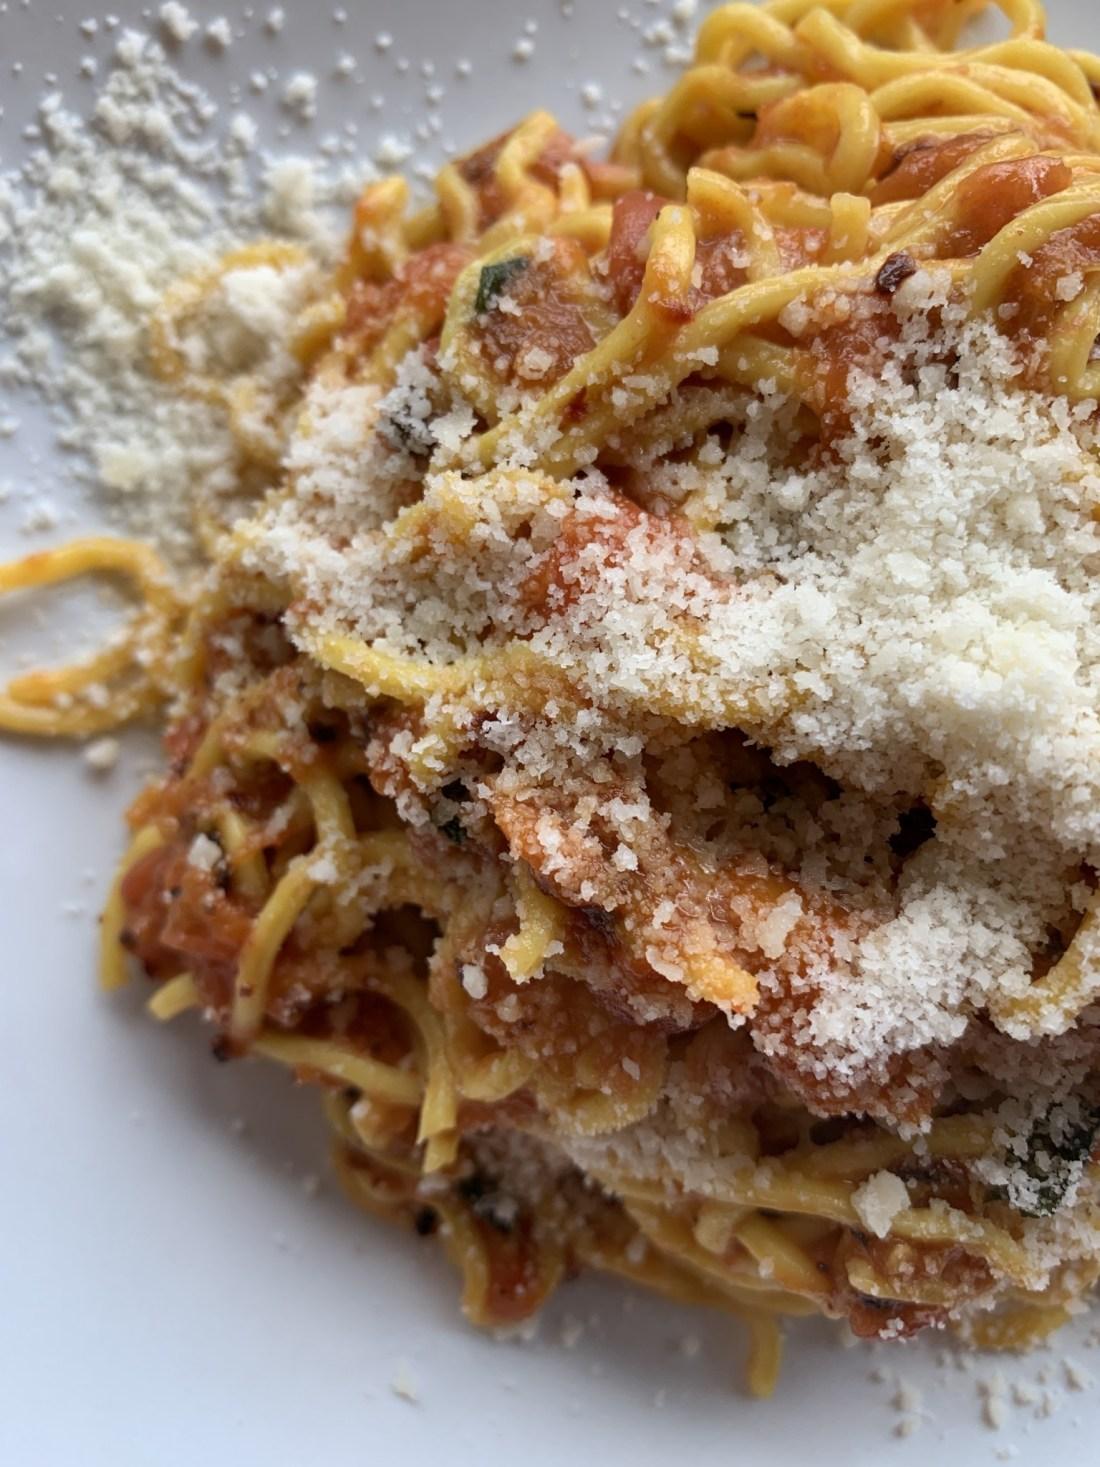 Spaghetti from BOH Pasta